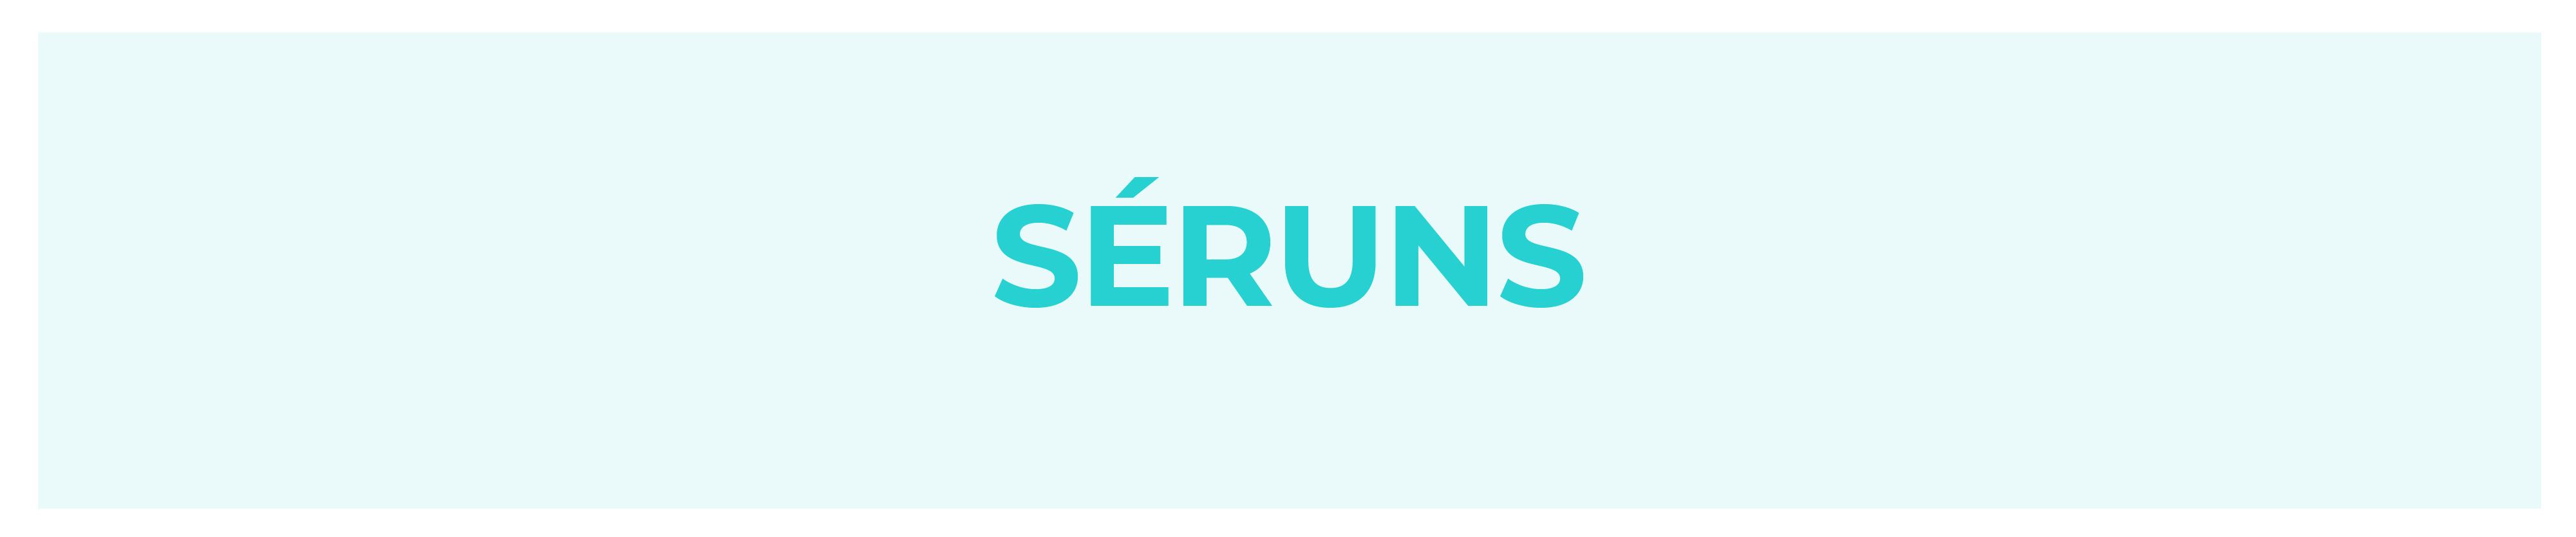 Banner Desktop - Sérum